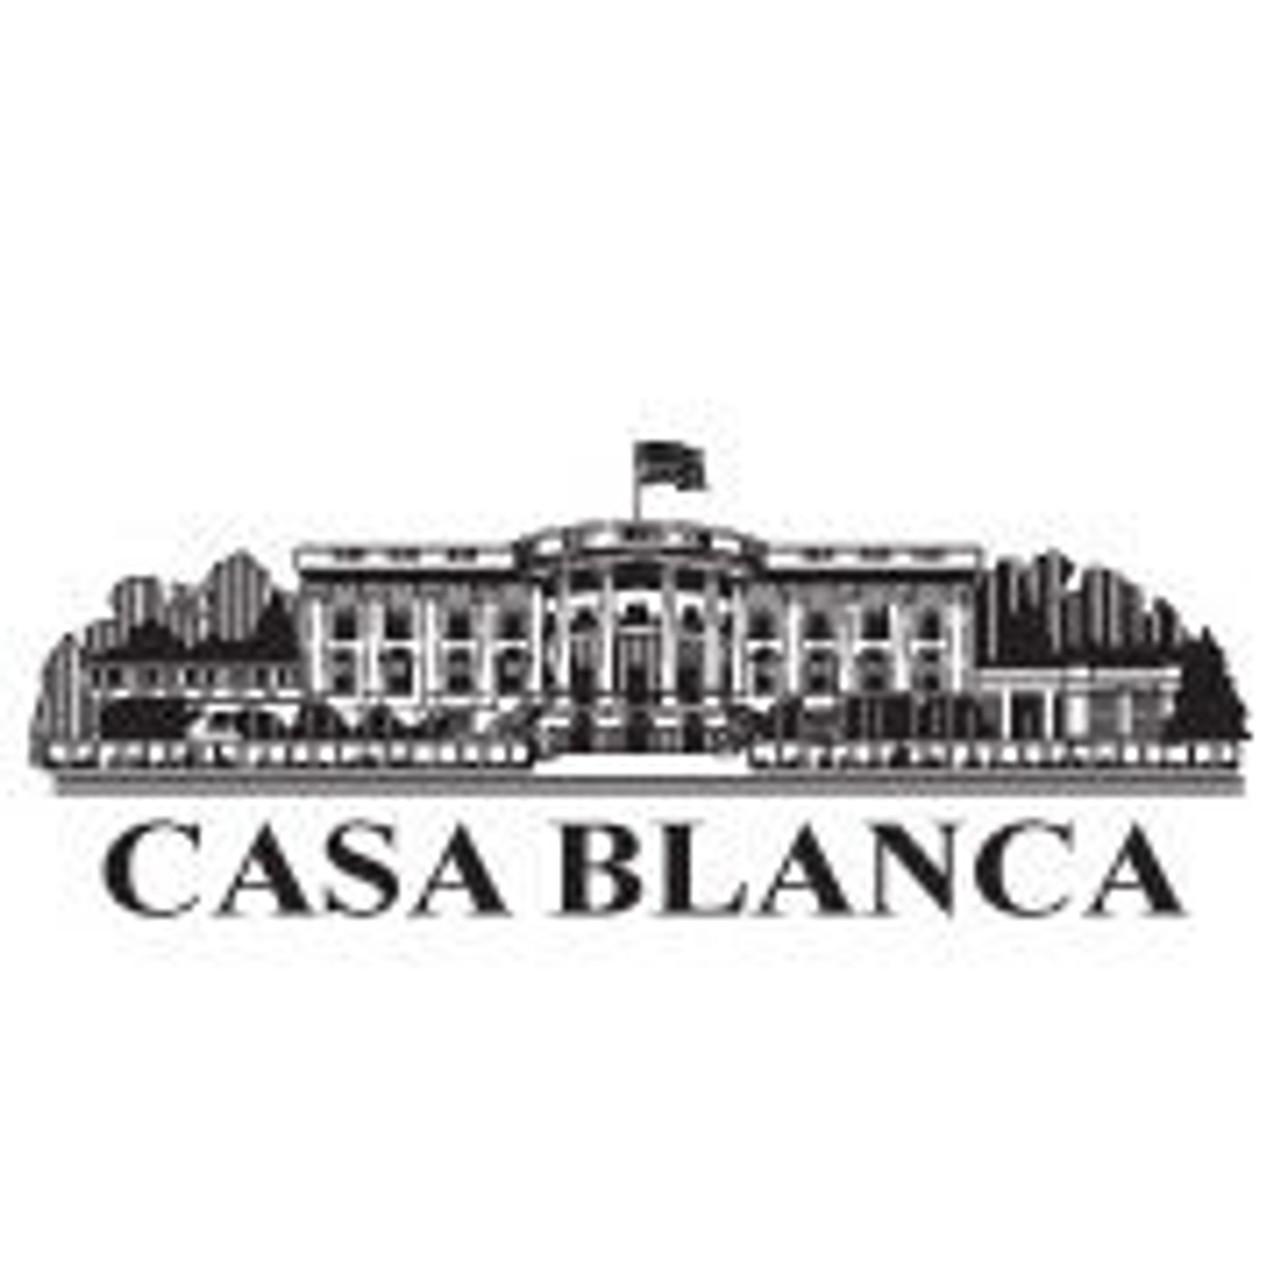 Casa Blanca President Cigars - 7.5 x 50 (Bundle of 20)